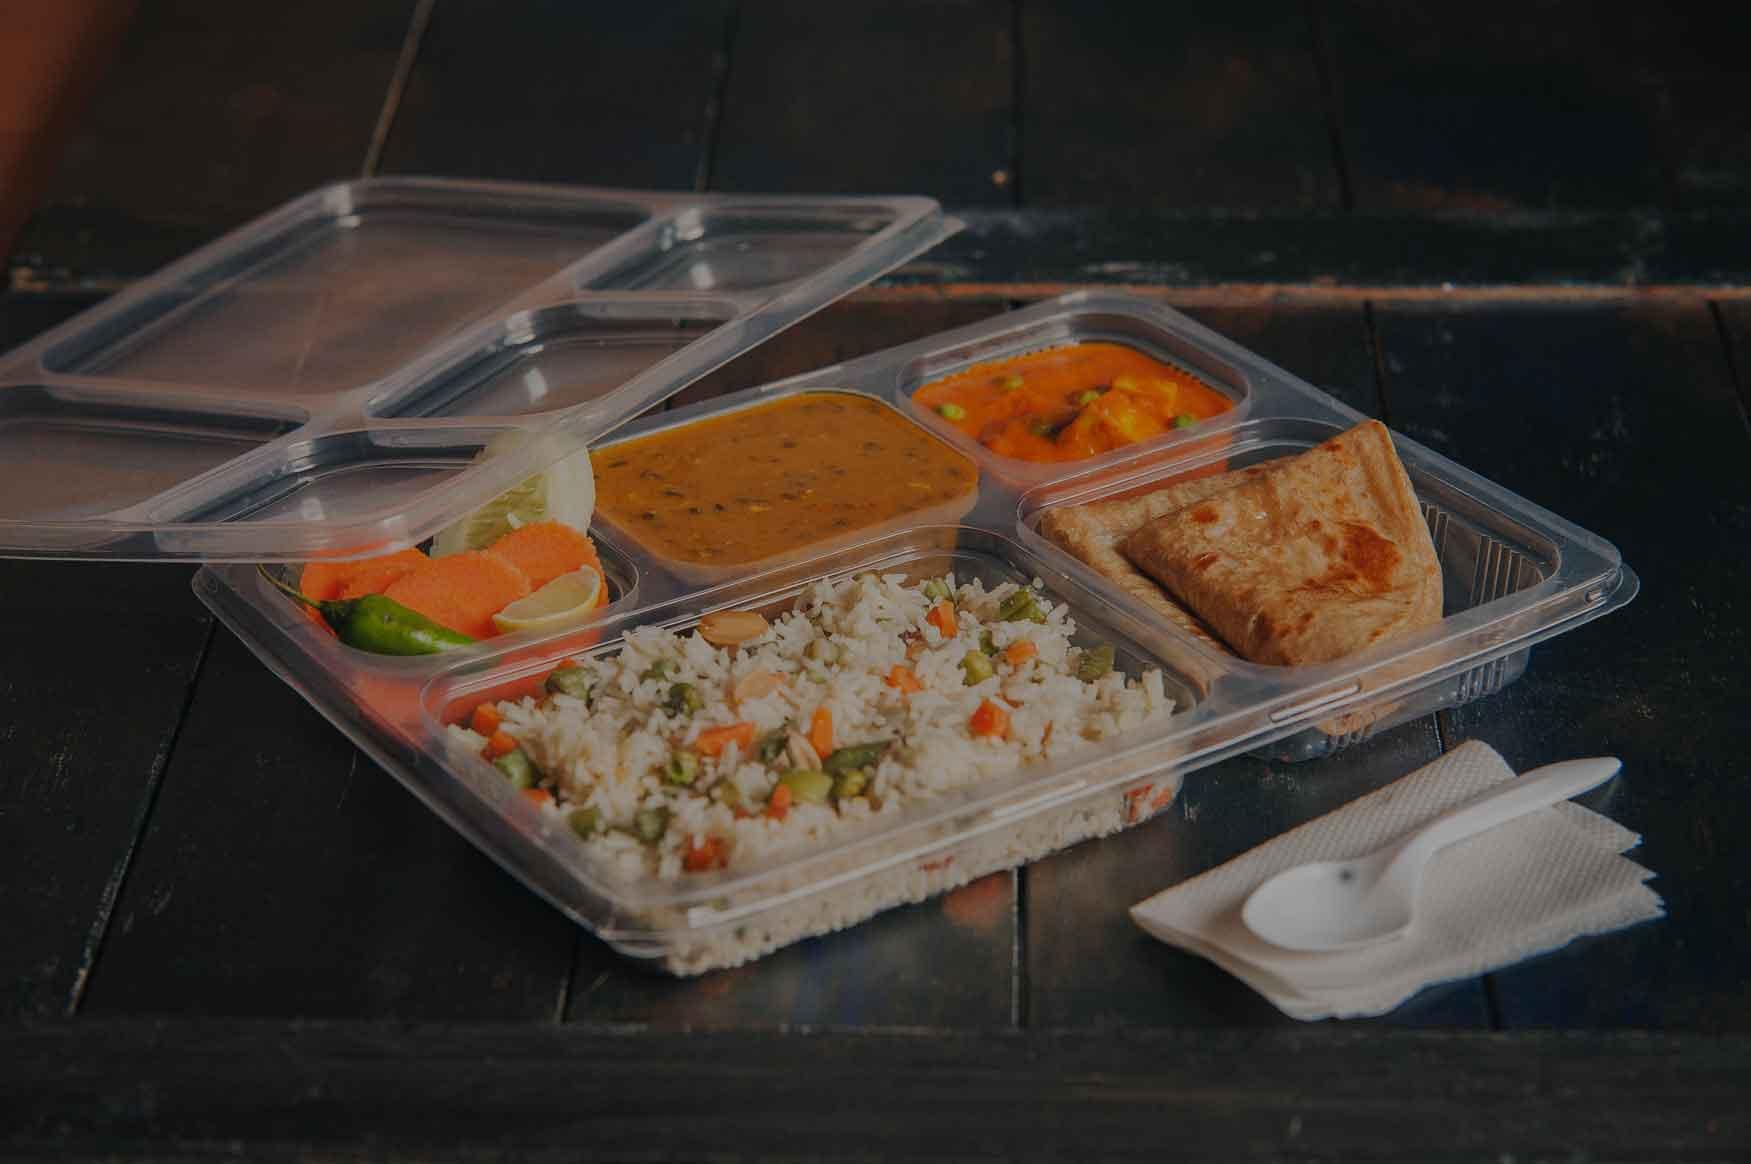 Best homemade Food Delivered at your doorstep in Kathmandu